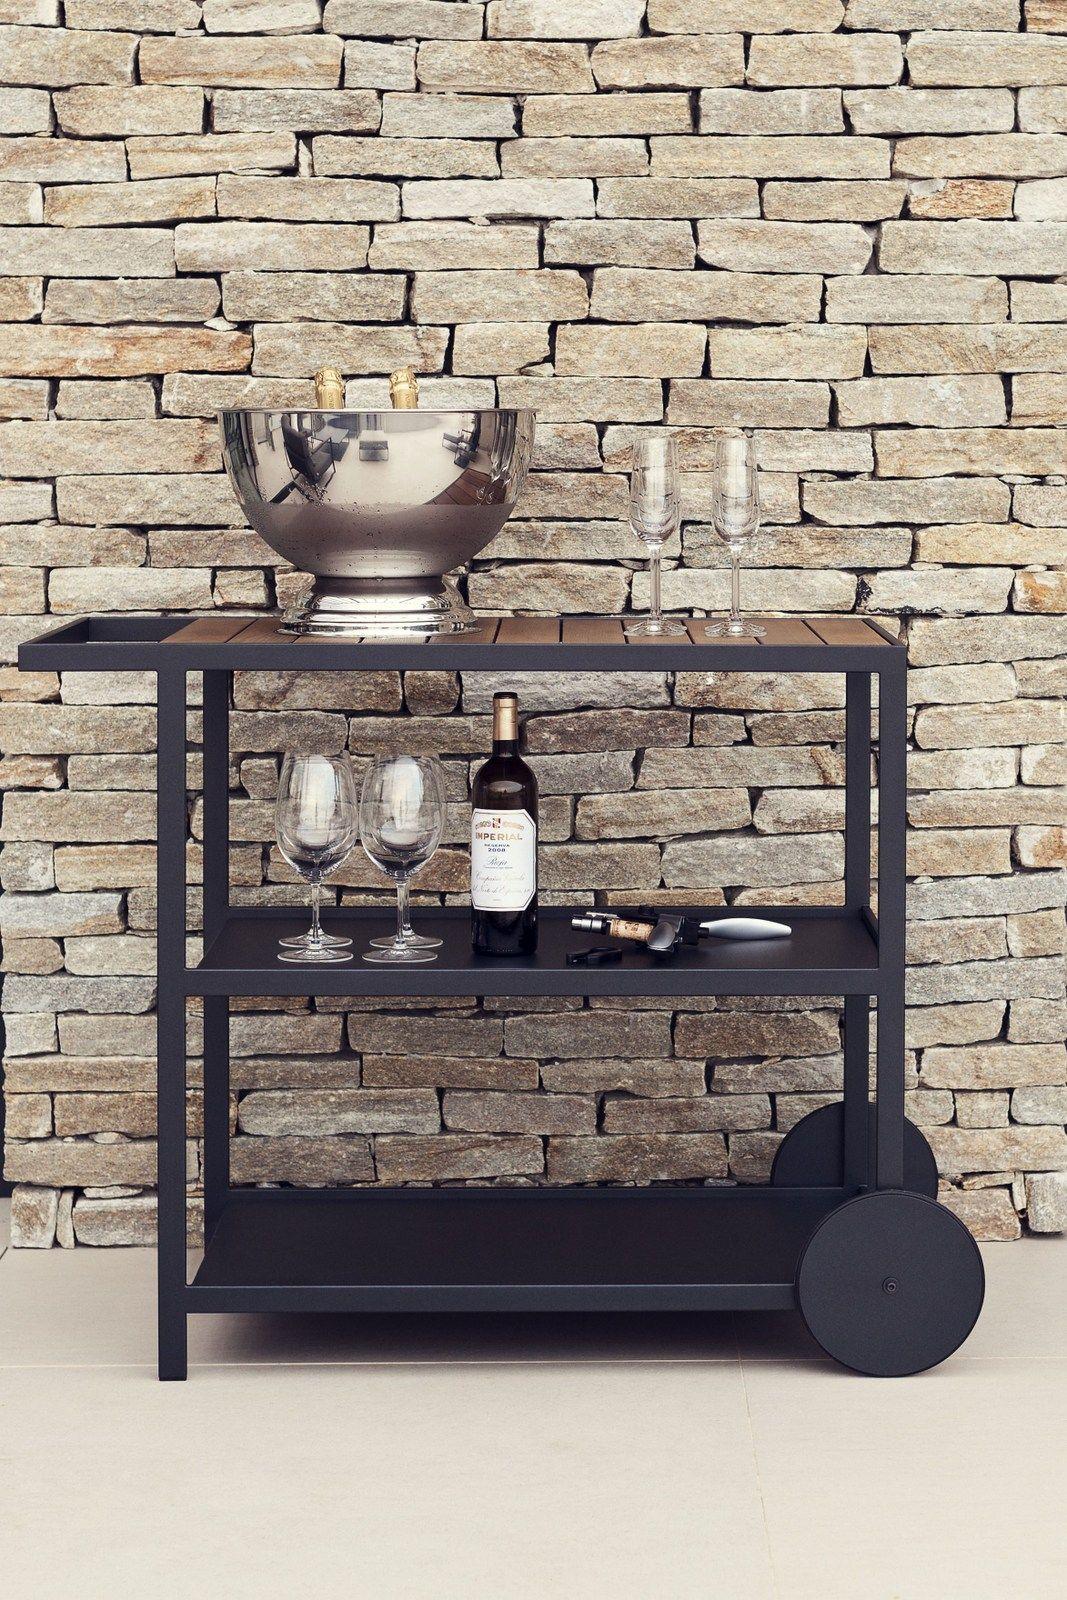 garden servierwagen by r shults design brda broberg ridderstr le. Black Bedroom Furniture Sets. Home Design Ideas